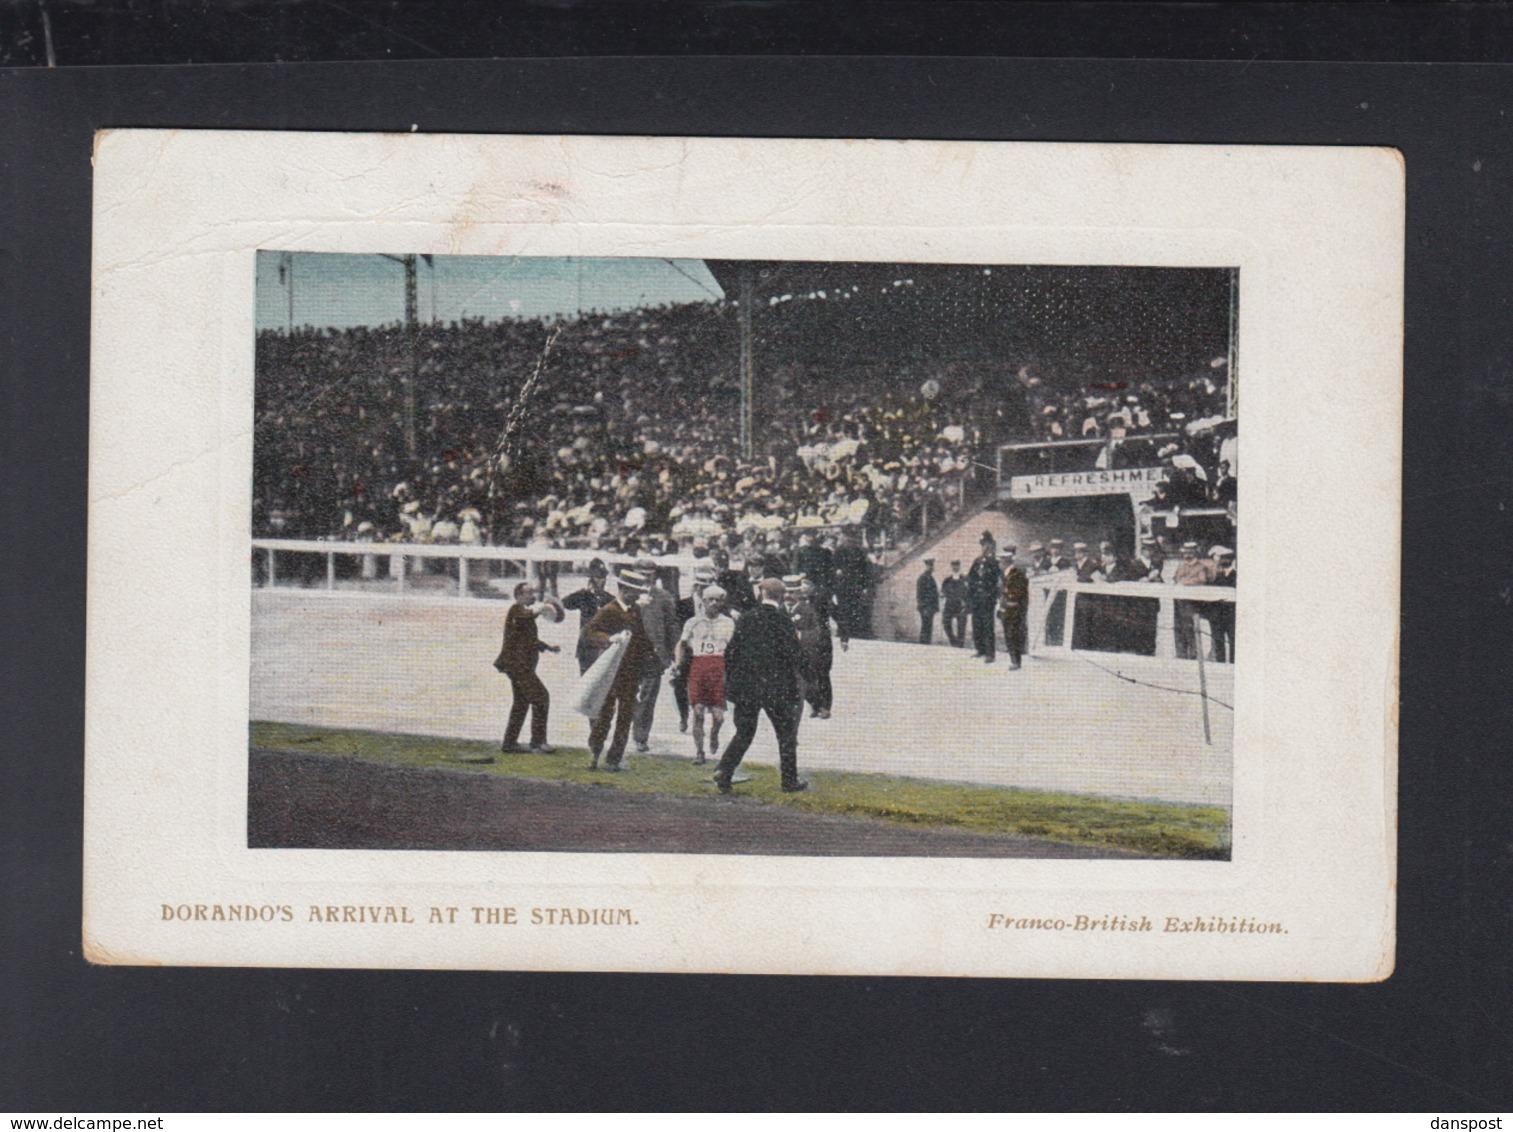 UK Exhibition PPC Dorando's Arrival At The Stadium - Olympic Games